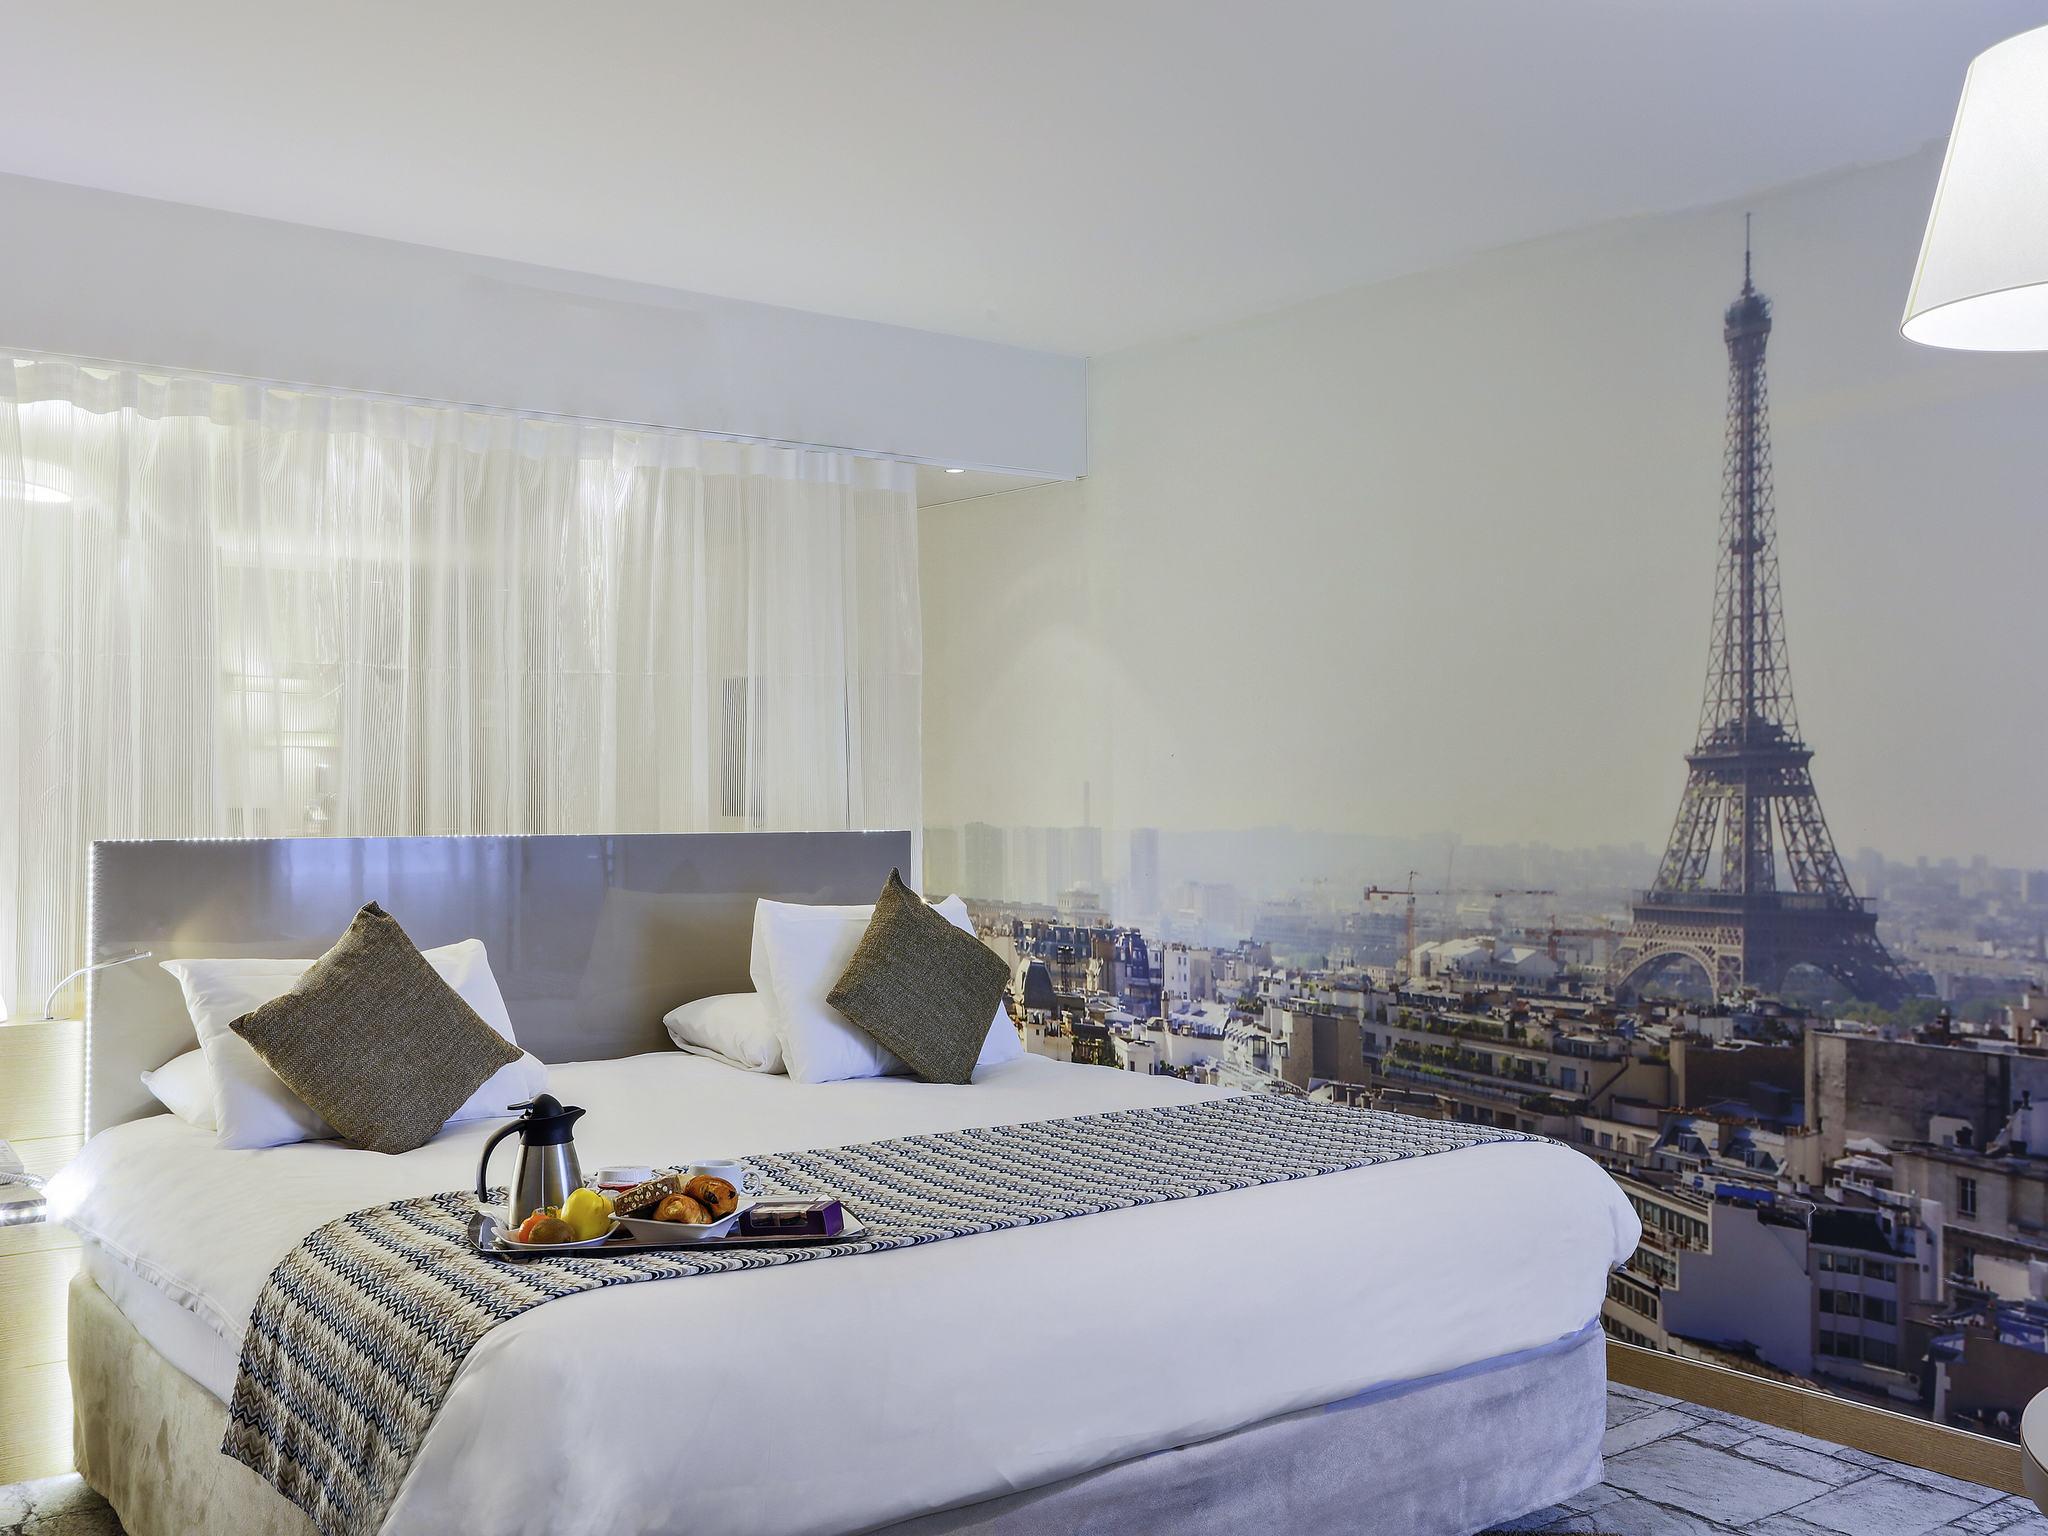 Hotel – Hotel Mercure Paris Vaugirard Porte de Versailles